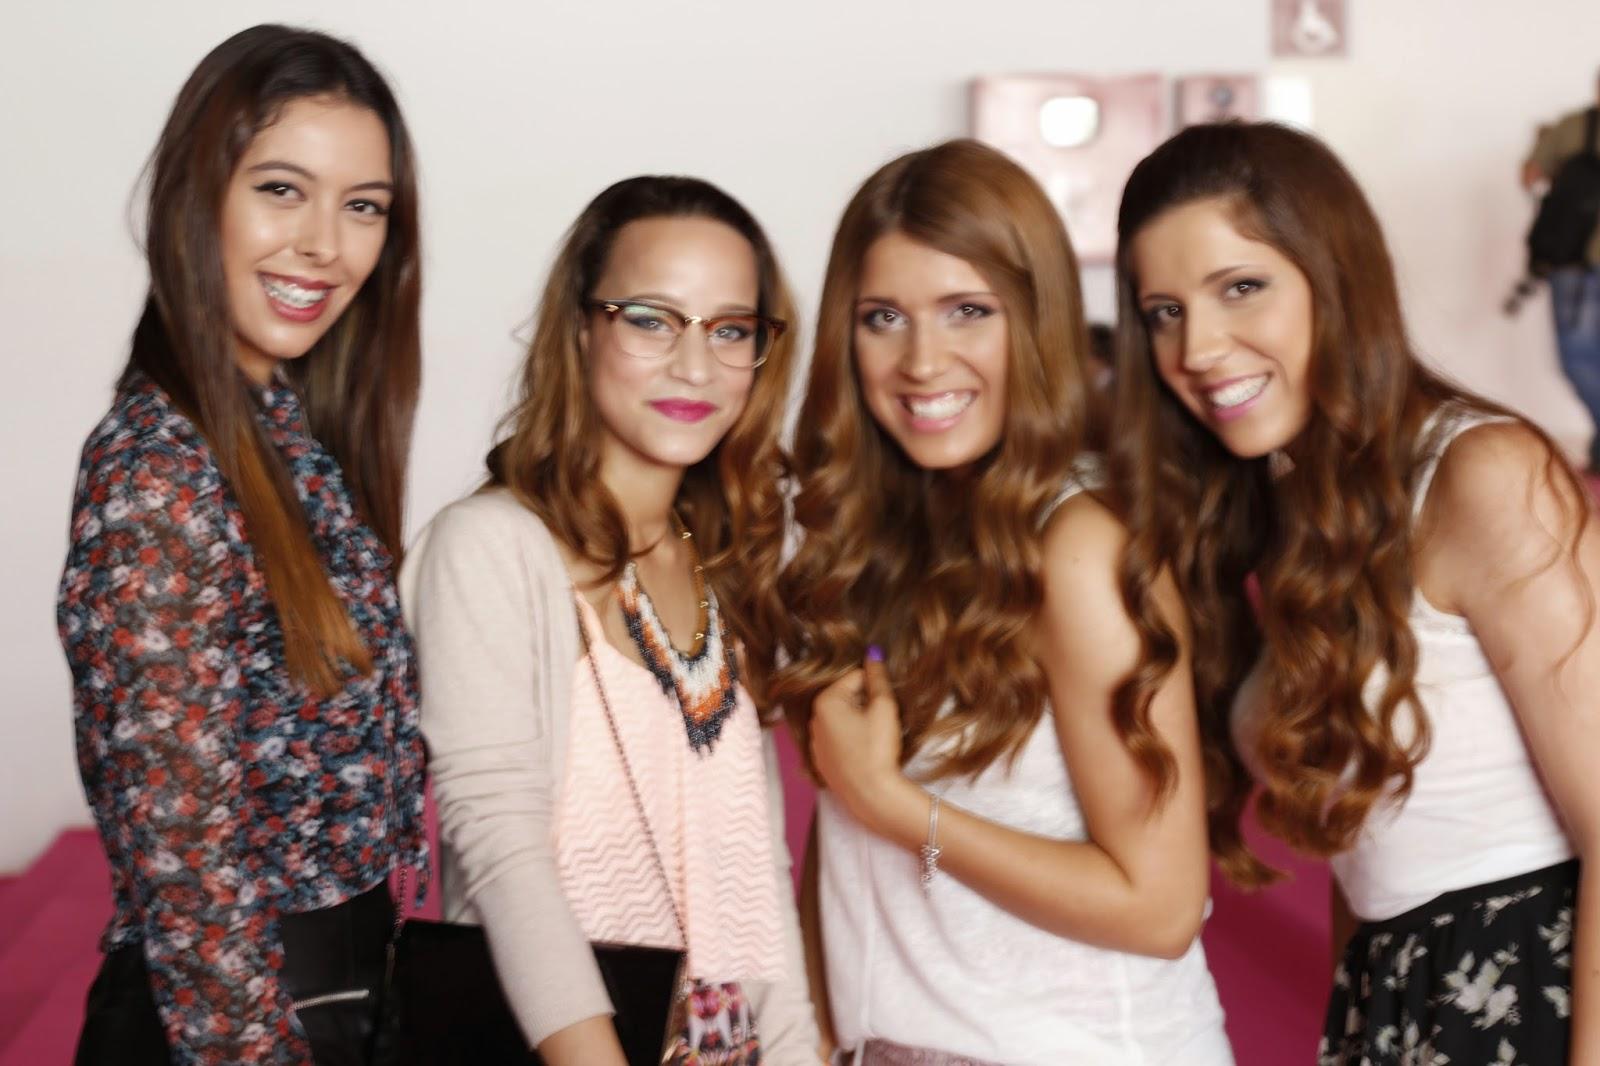 Projecto Chic   The girls studio   Beauty dream